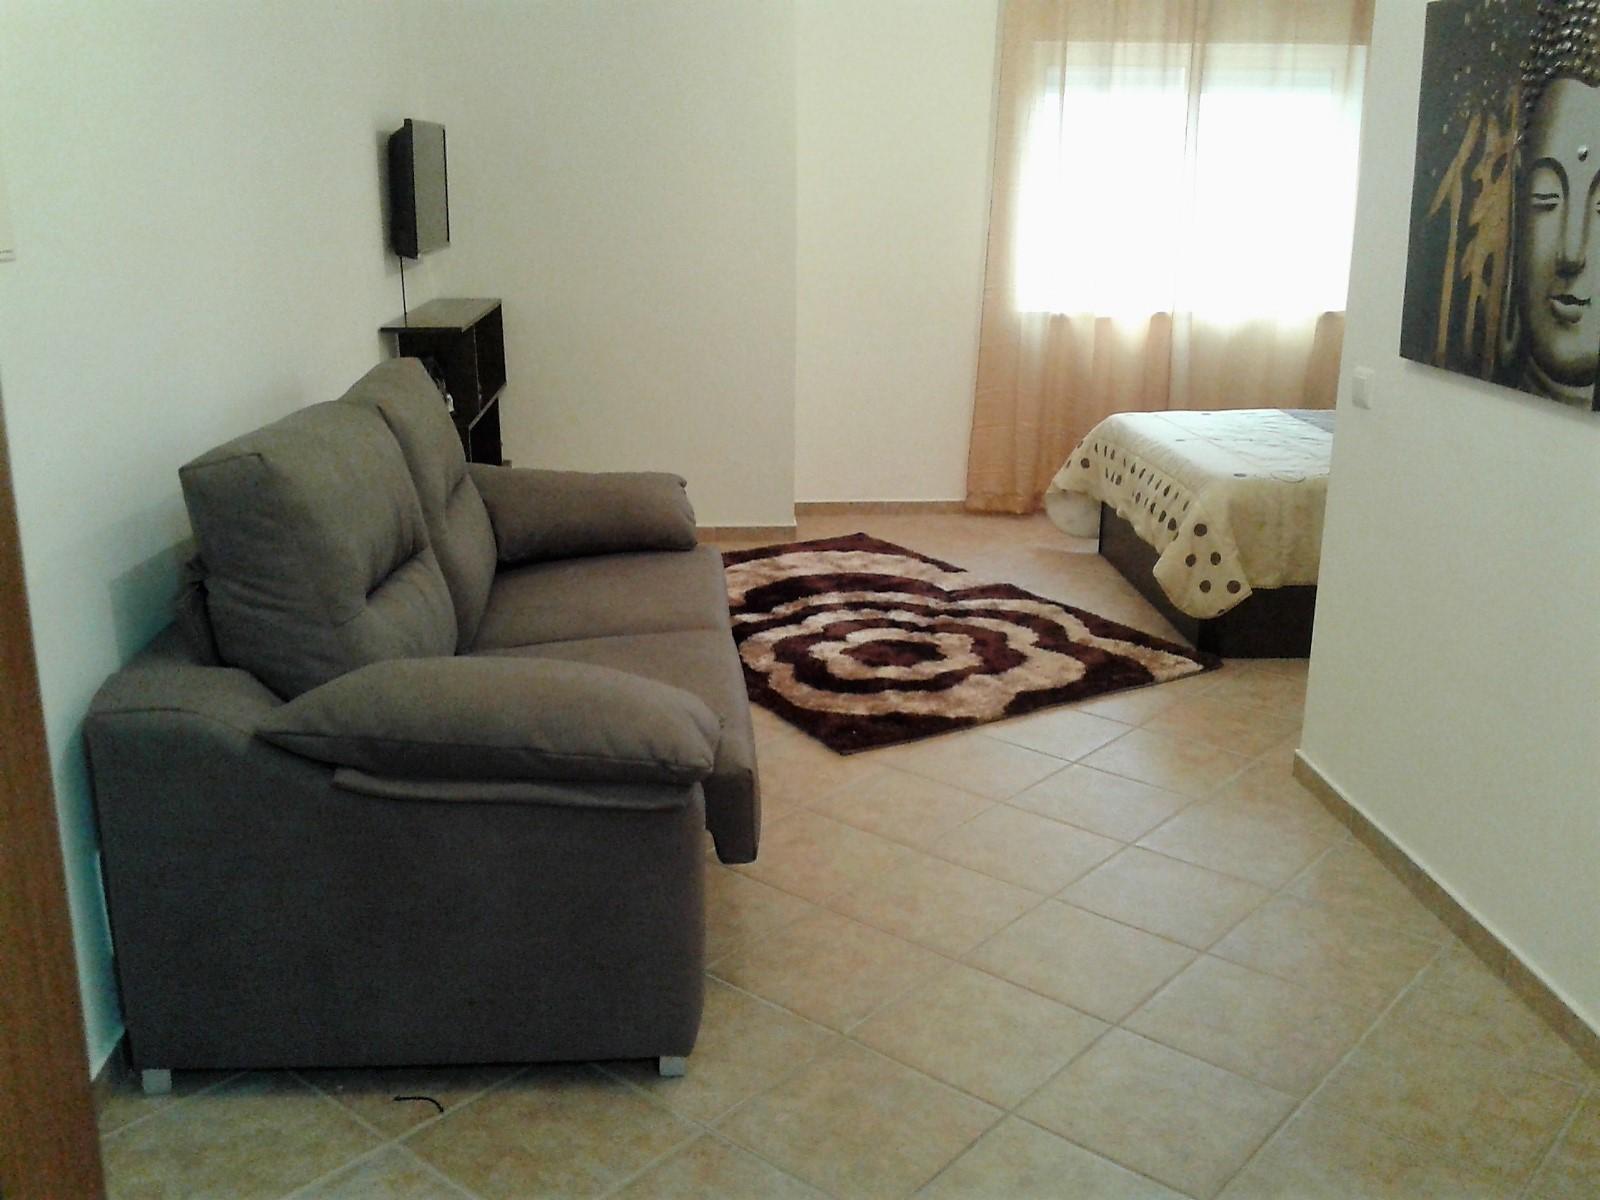 Holiday apartments and villas for rent, CASA NEUZA in Fuzeta, Portugal Algarve, REF_IMG_4092_4093